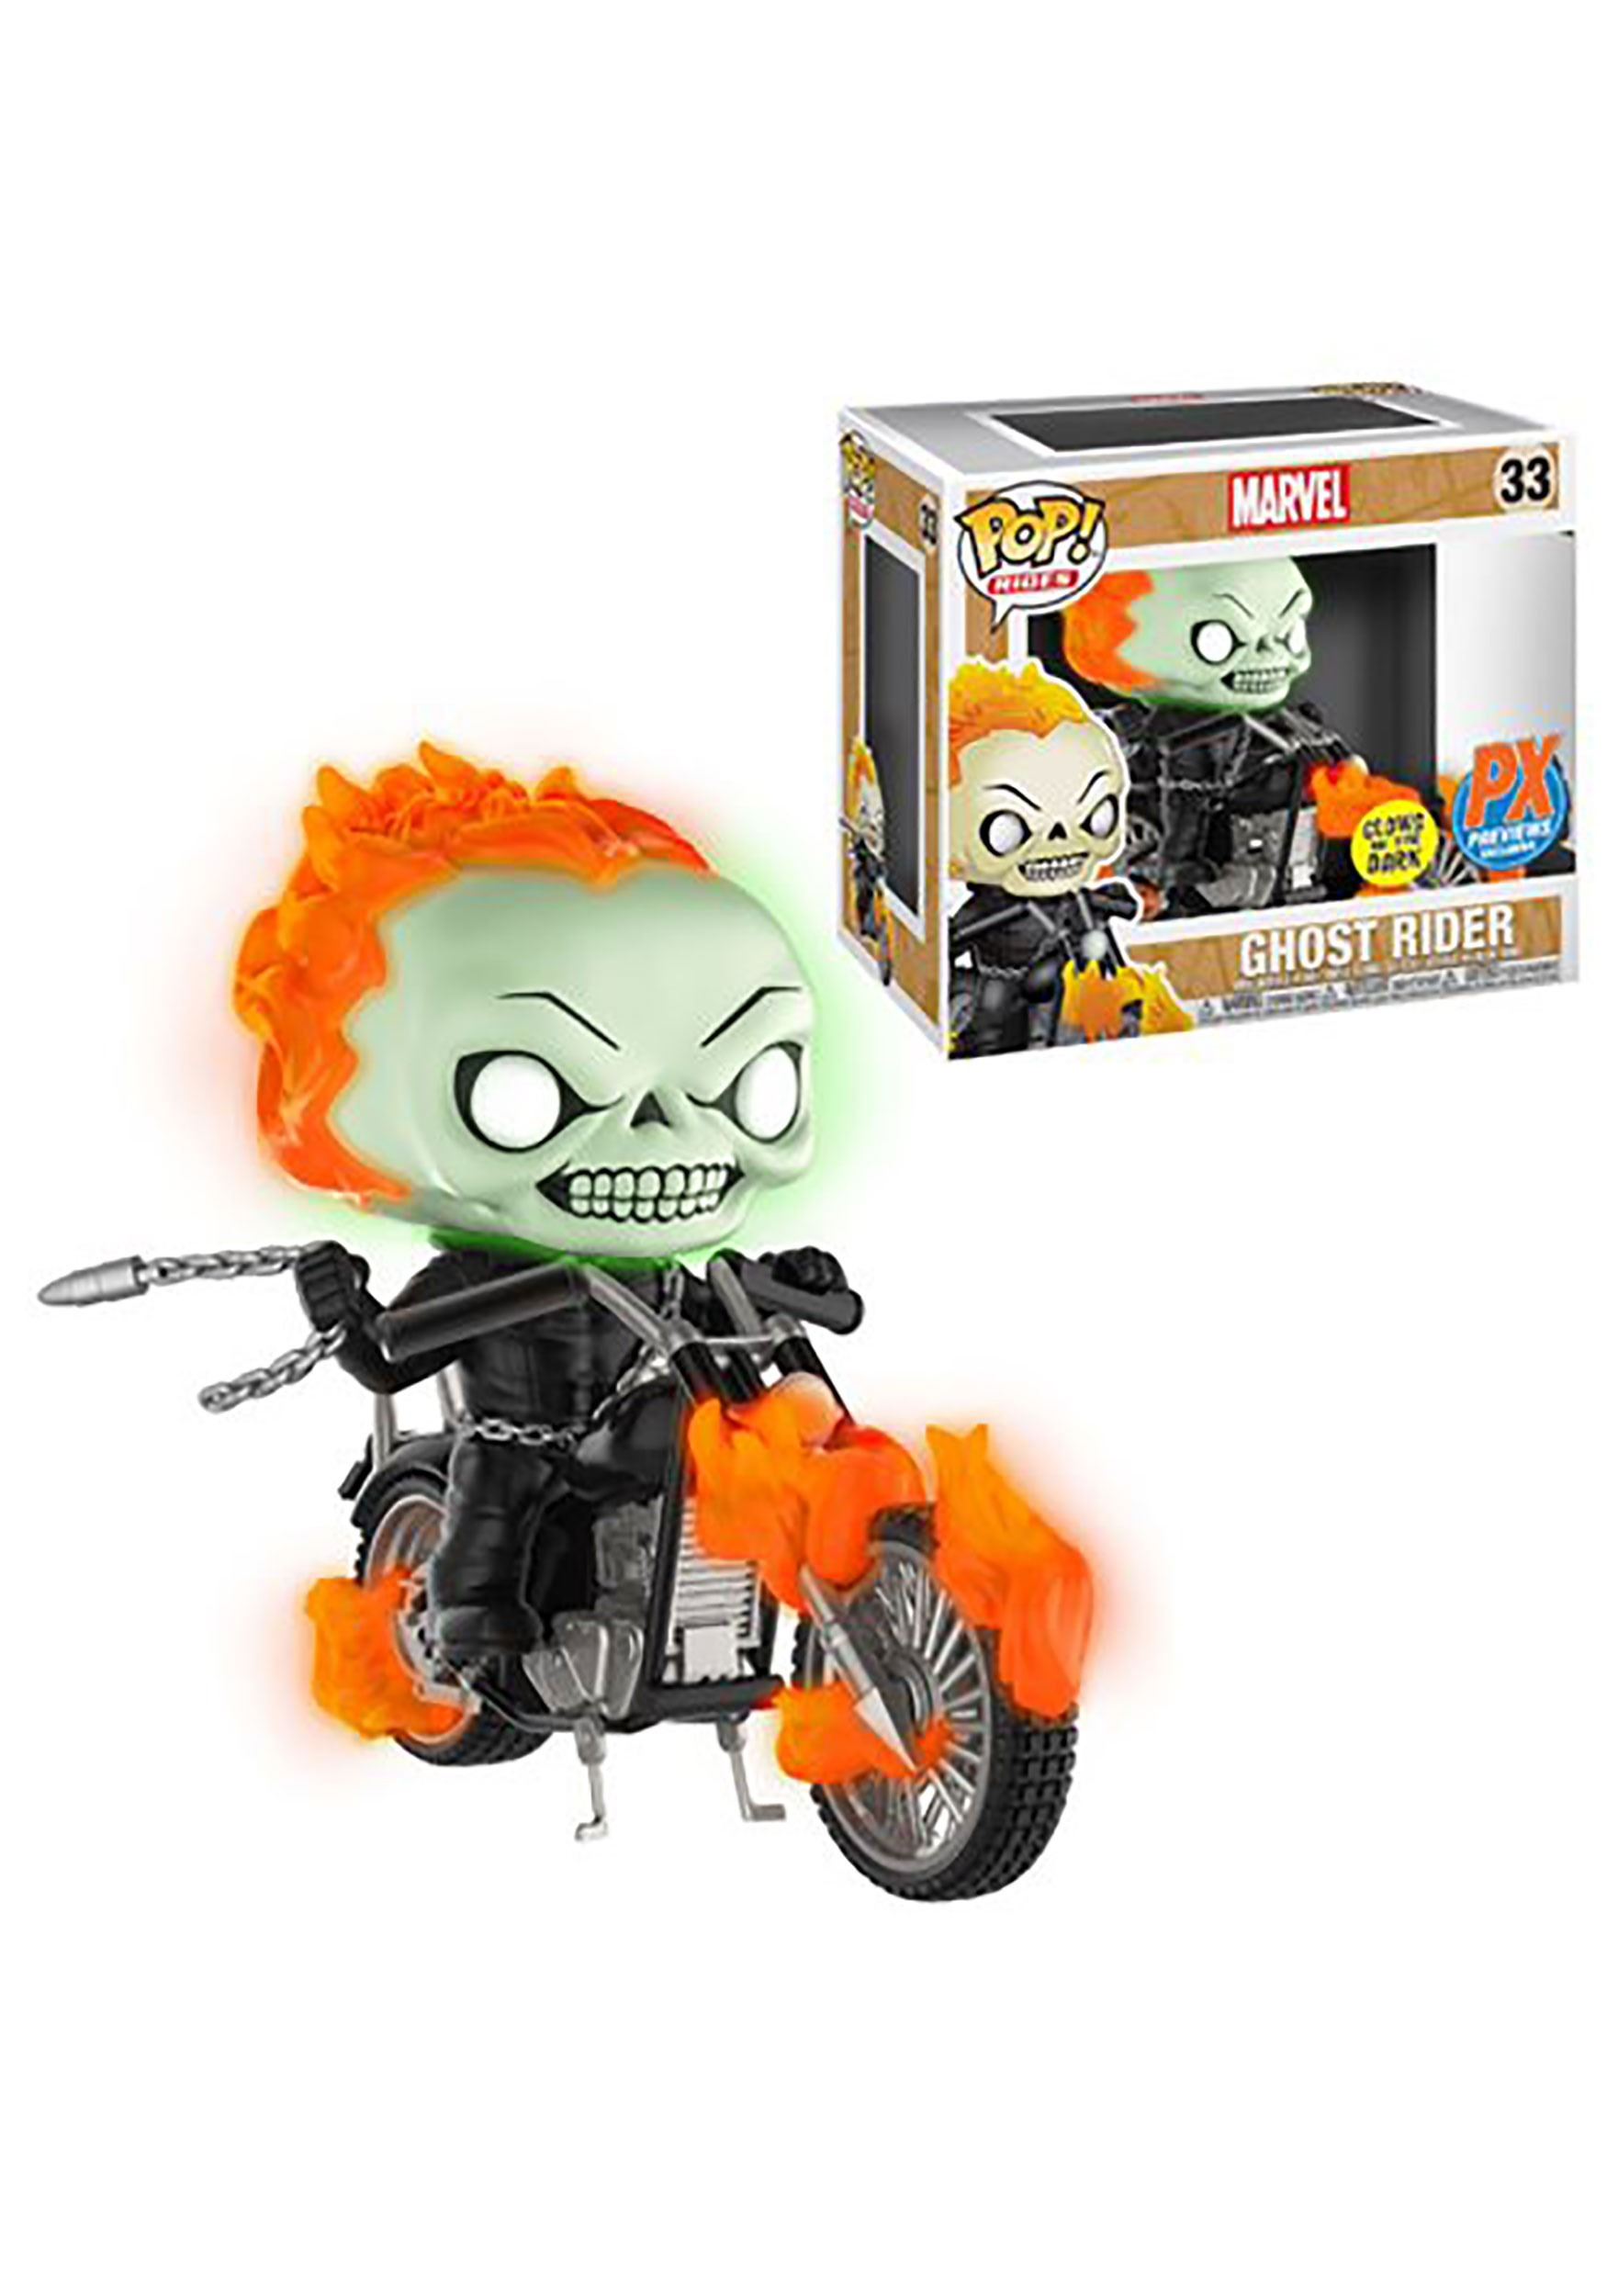 Marvel Classic Ghost Rider with Bike Glow-in-the Dark Figure EEDDC248594